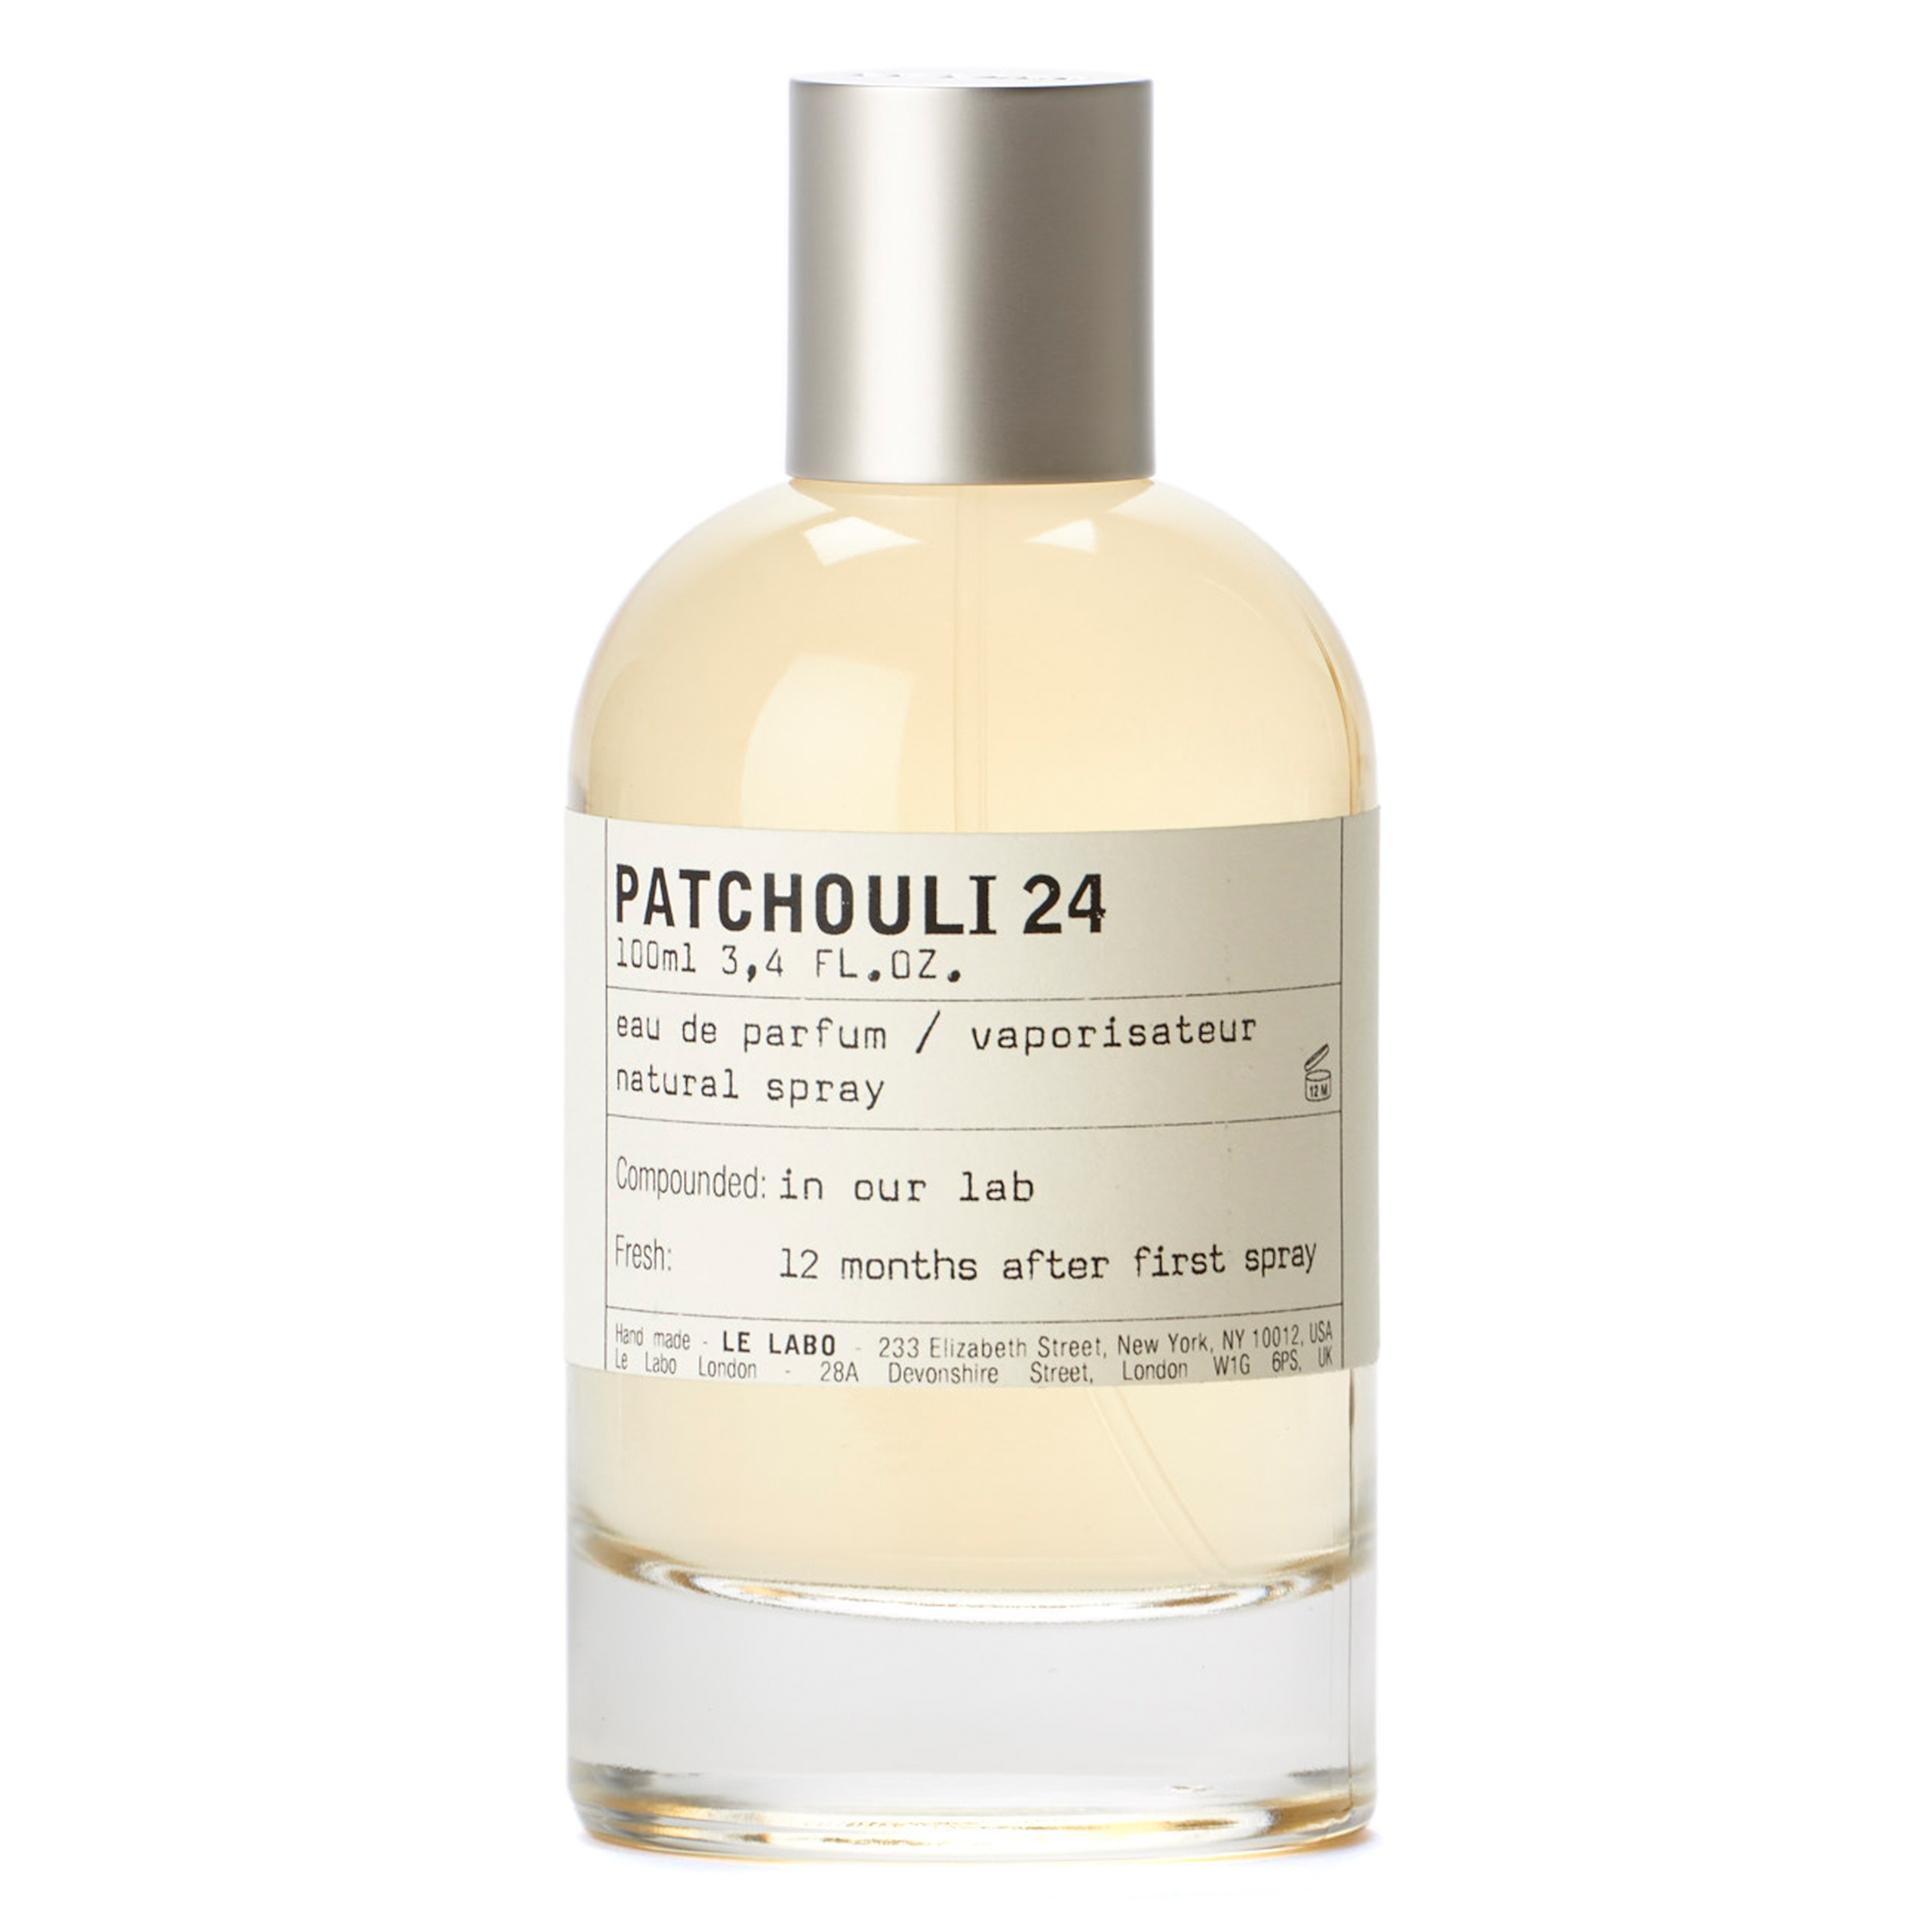 Patchouli 24 Edp 100ml